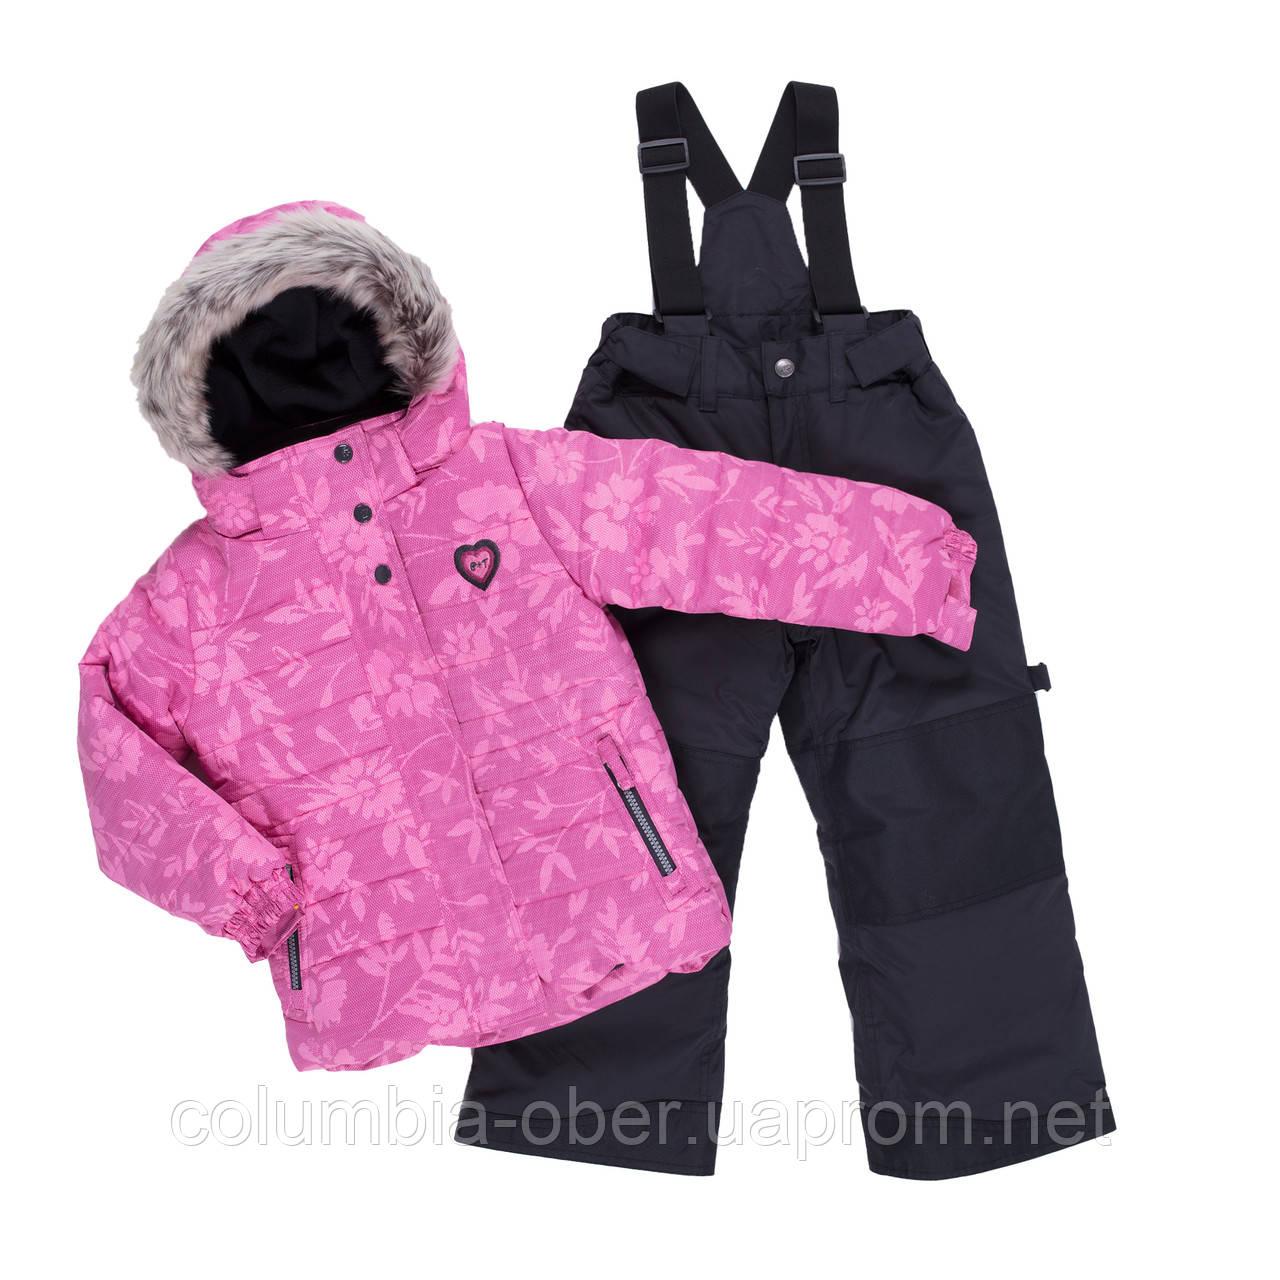 Зимний костюм для девочки PELUCHE & TARTINE F19M50EF RoyalBerry/DeepGray. Размеры 3 - 8 лет.